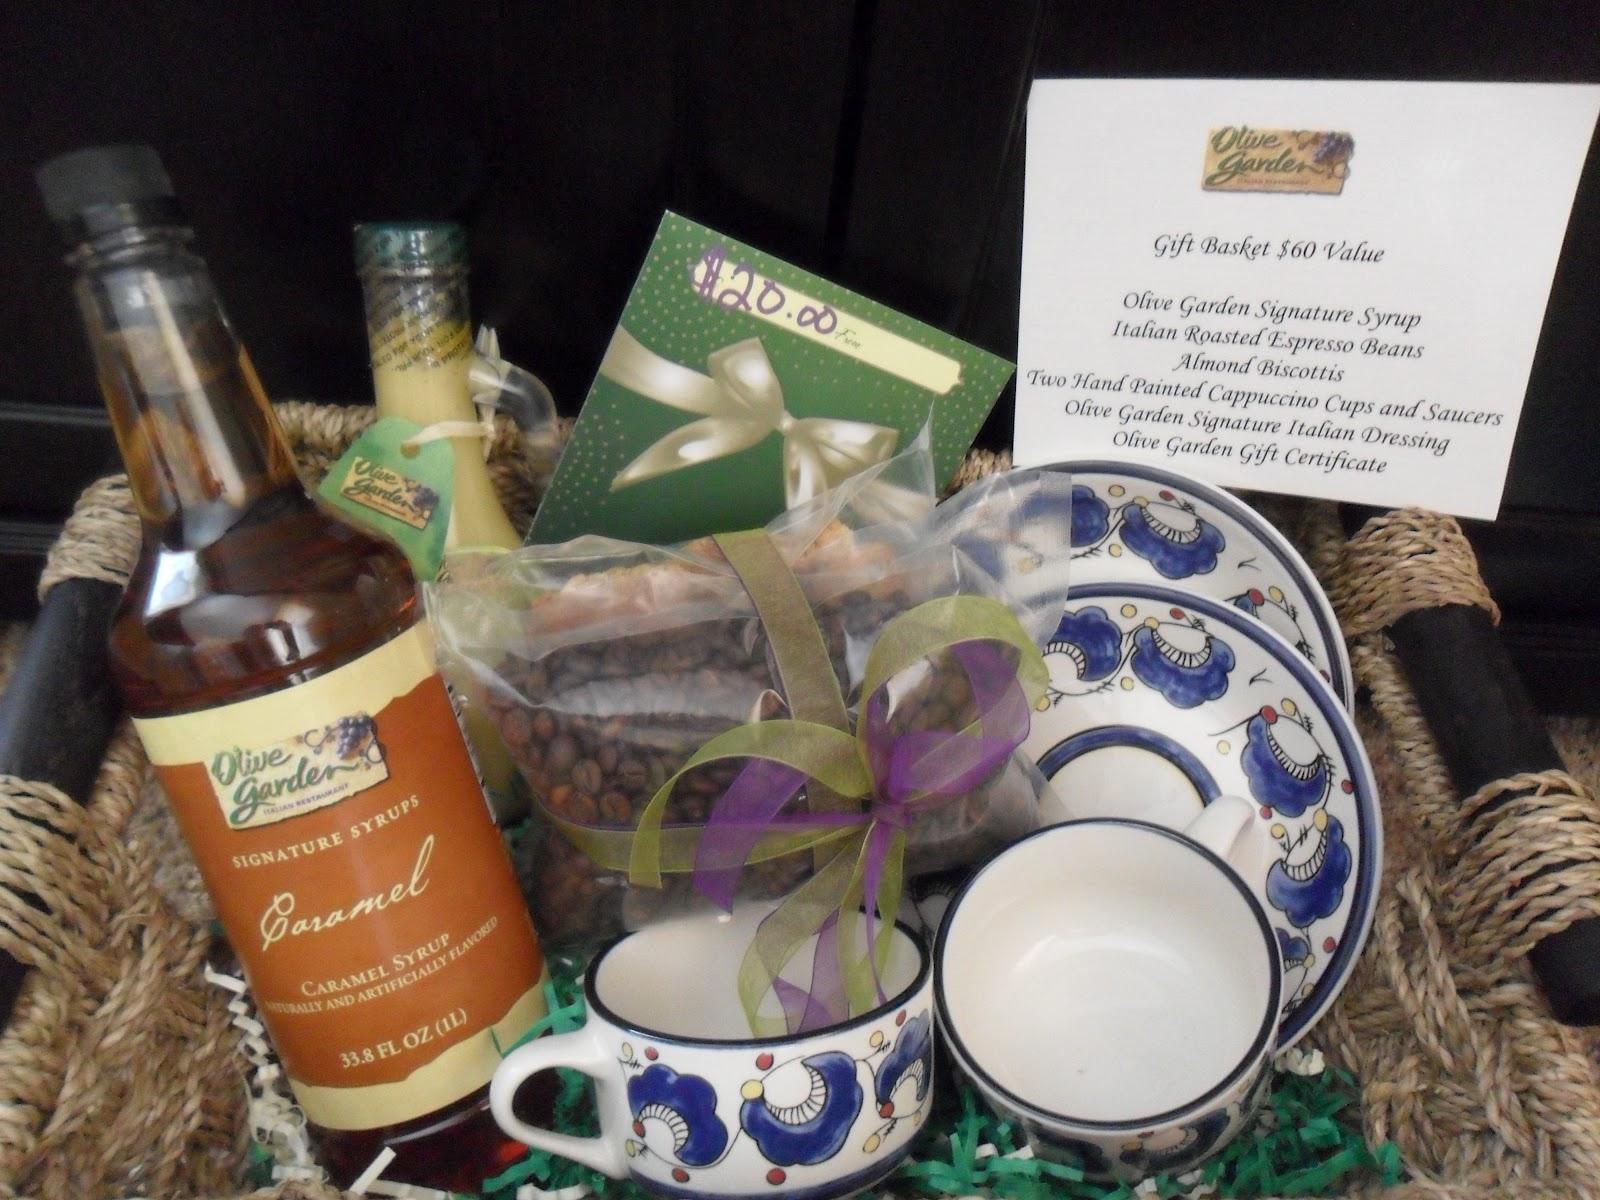 Go Team Anthony Olive Garden Gift Basket Gift Card